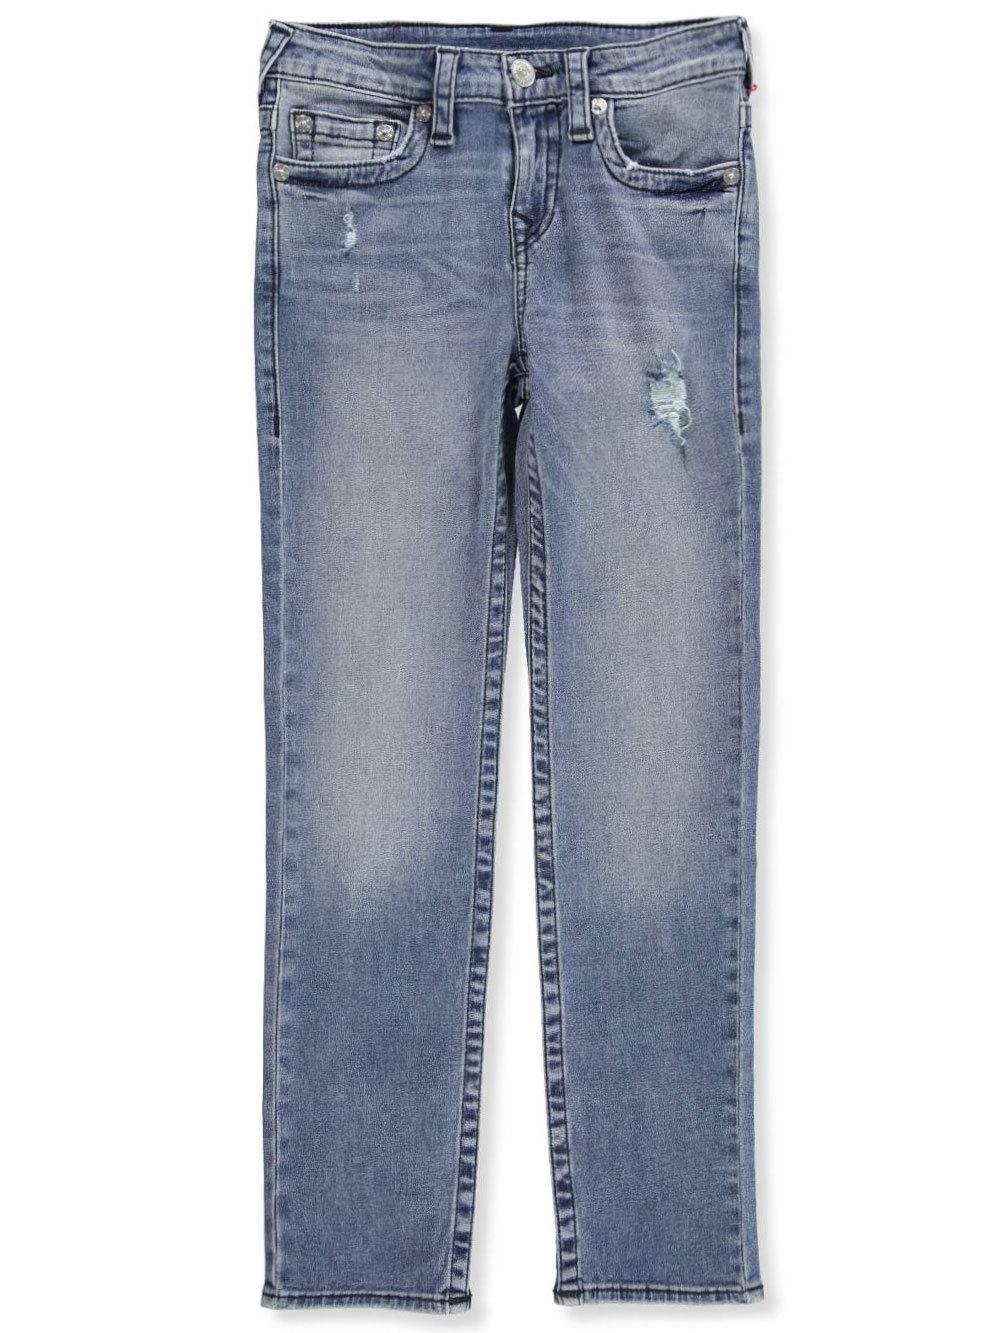 True Religion Big Boys' Jeans - Colors as Shown, 10